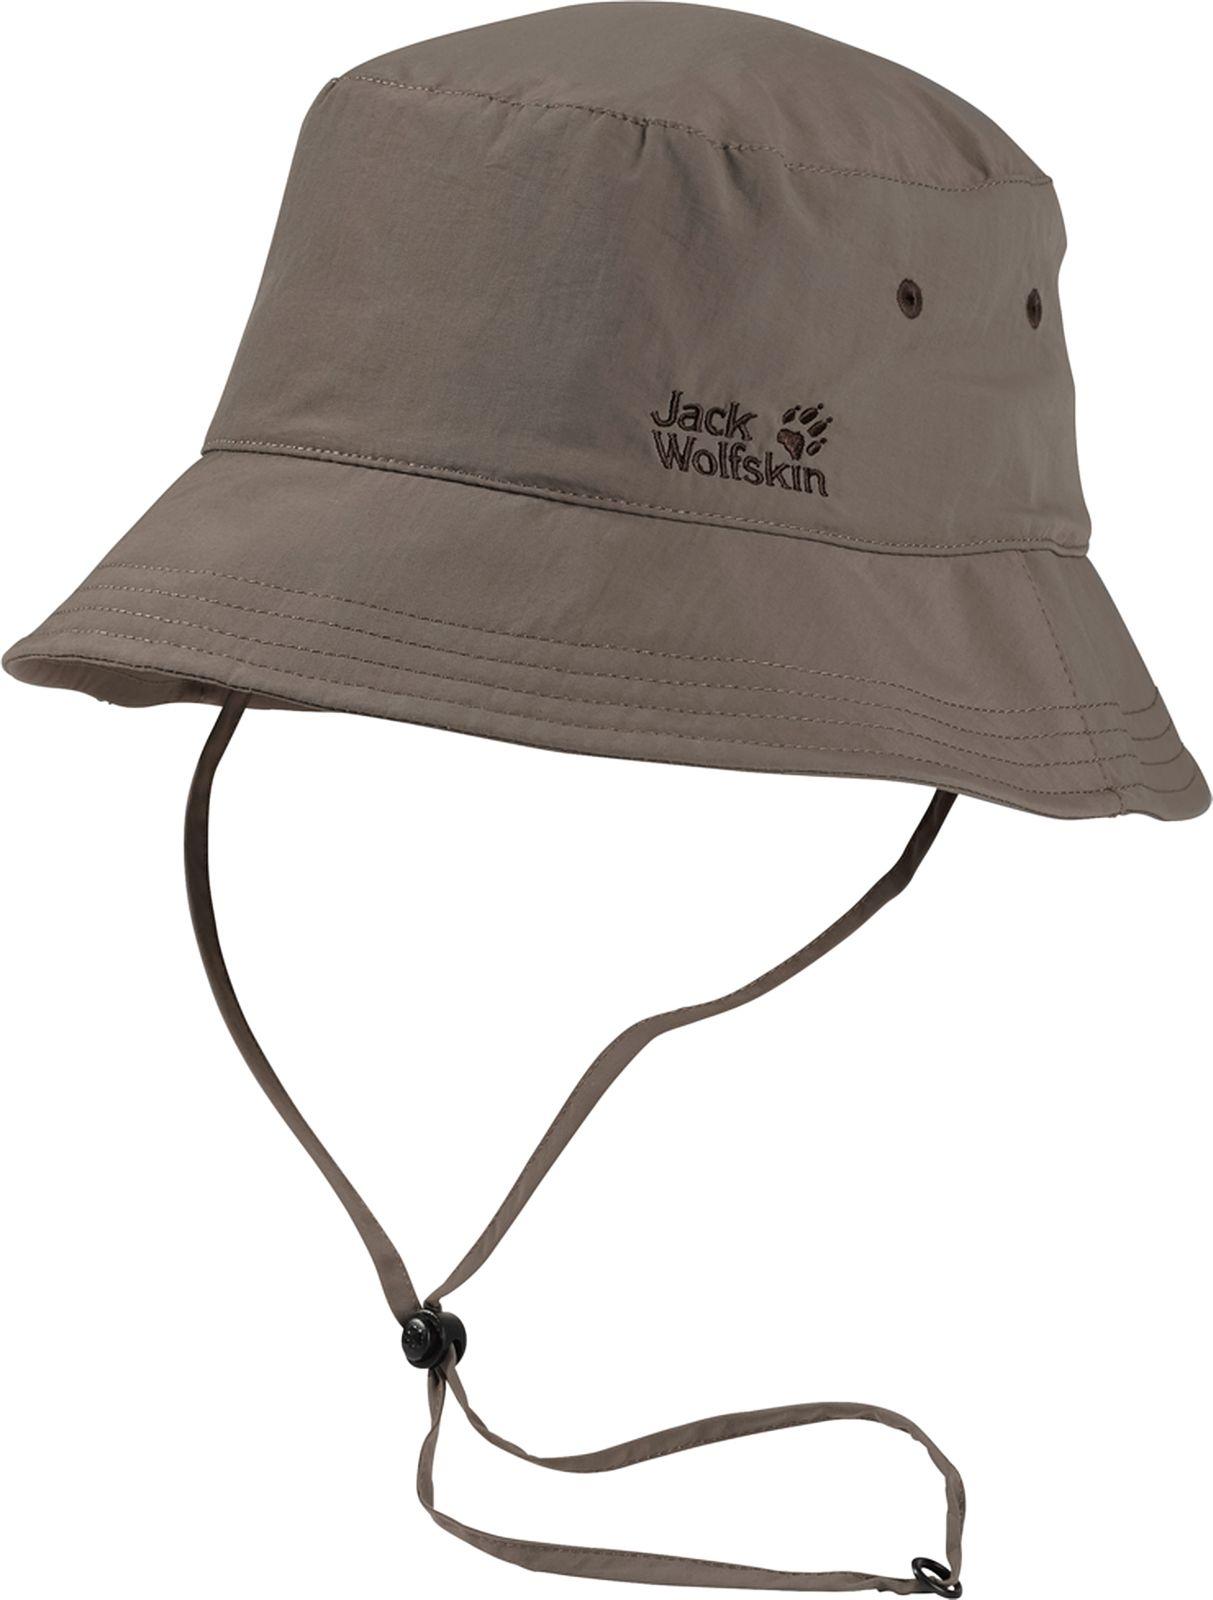 Панама Jack Wolfskin Supplex Sun Hat, цвет: темно-бежевый. 1903391-5116. Размер L (57/60) jack wolfskin кепка supplex cap women